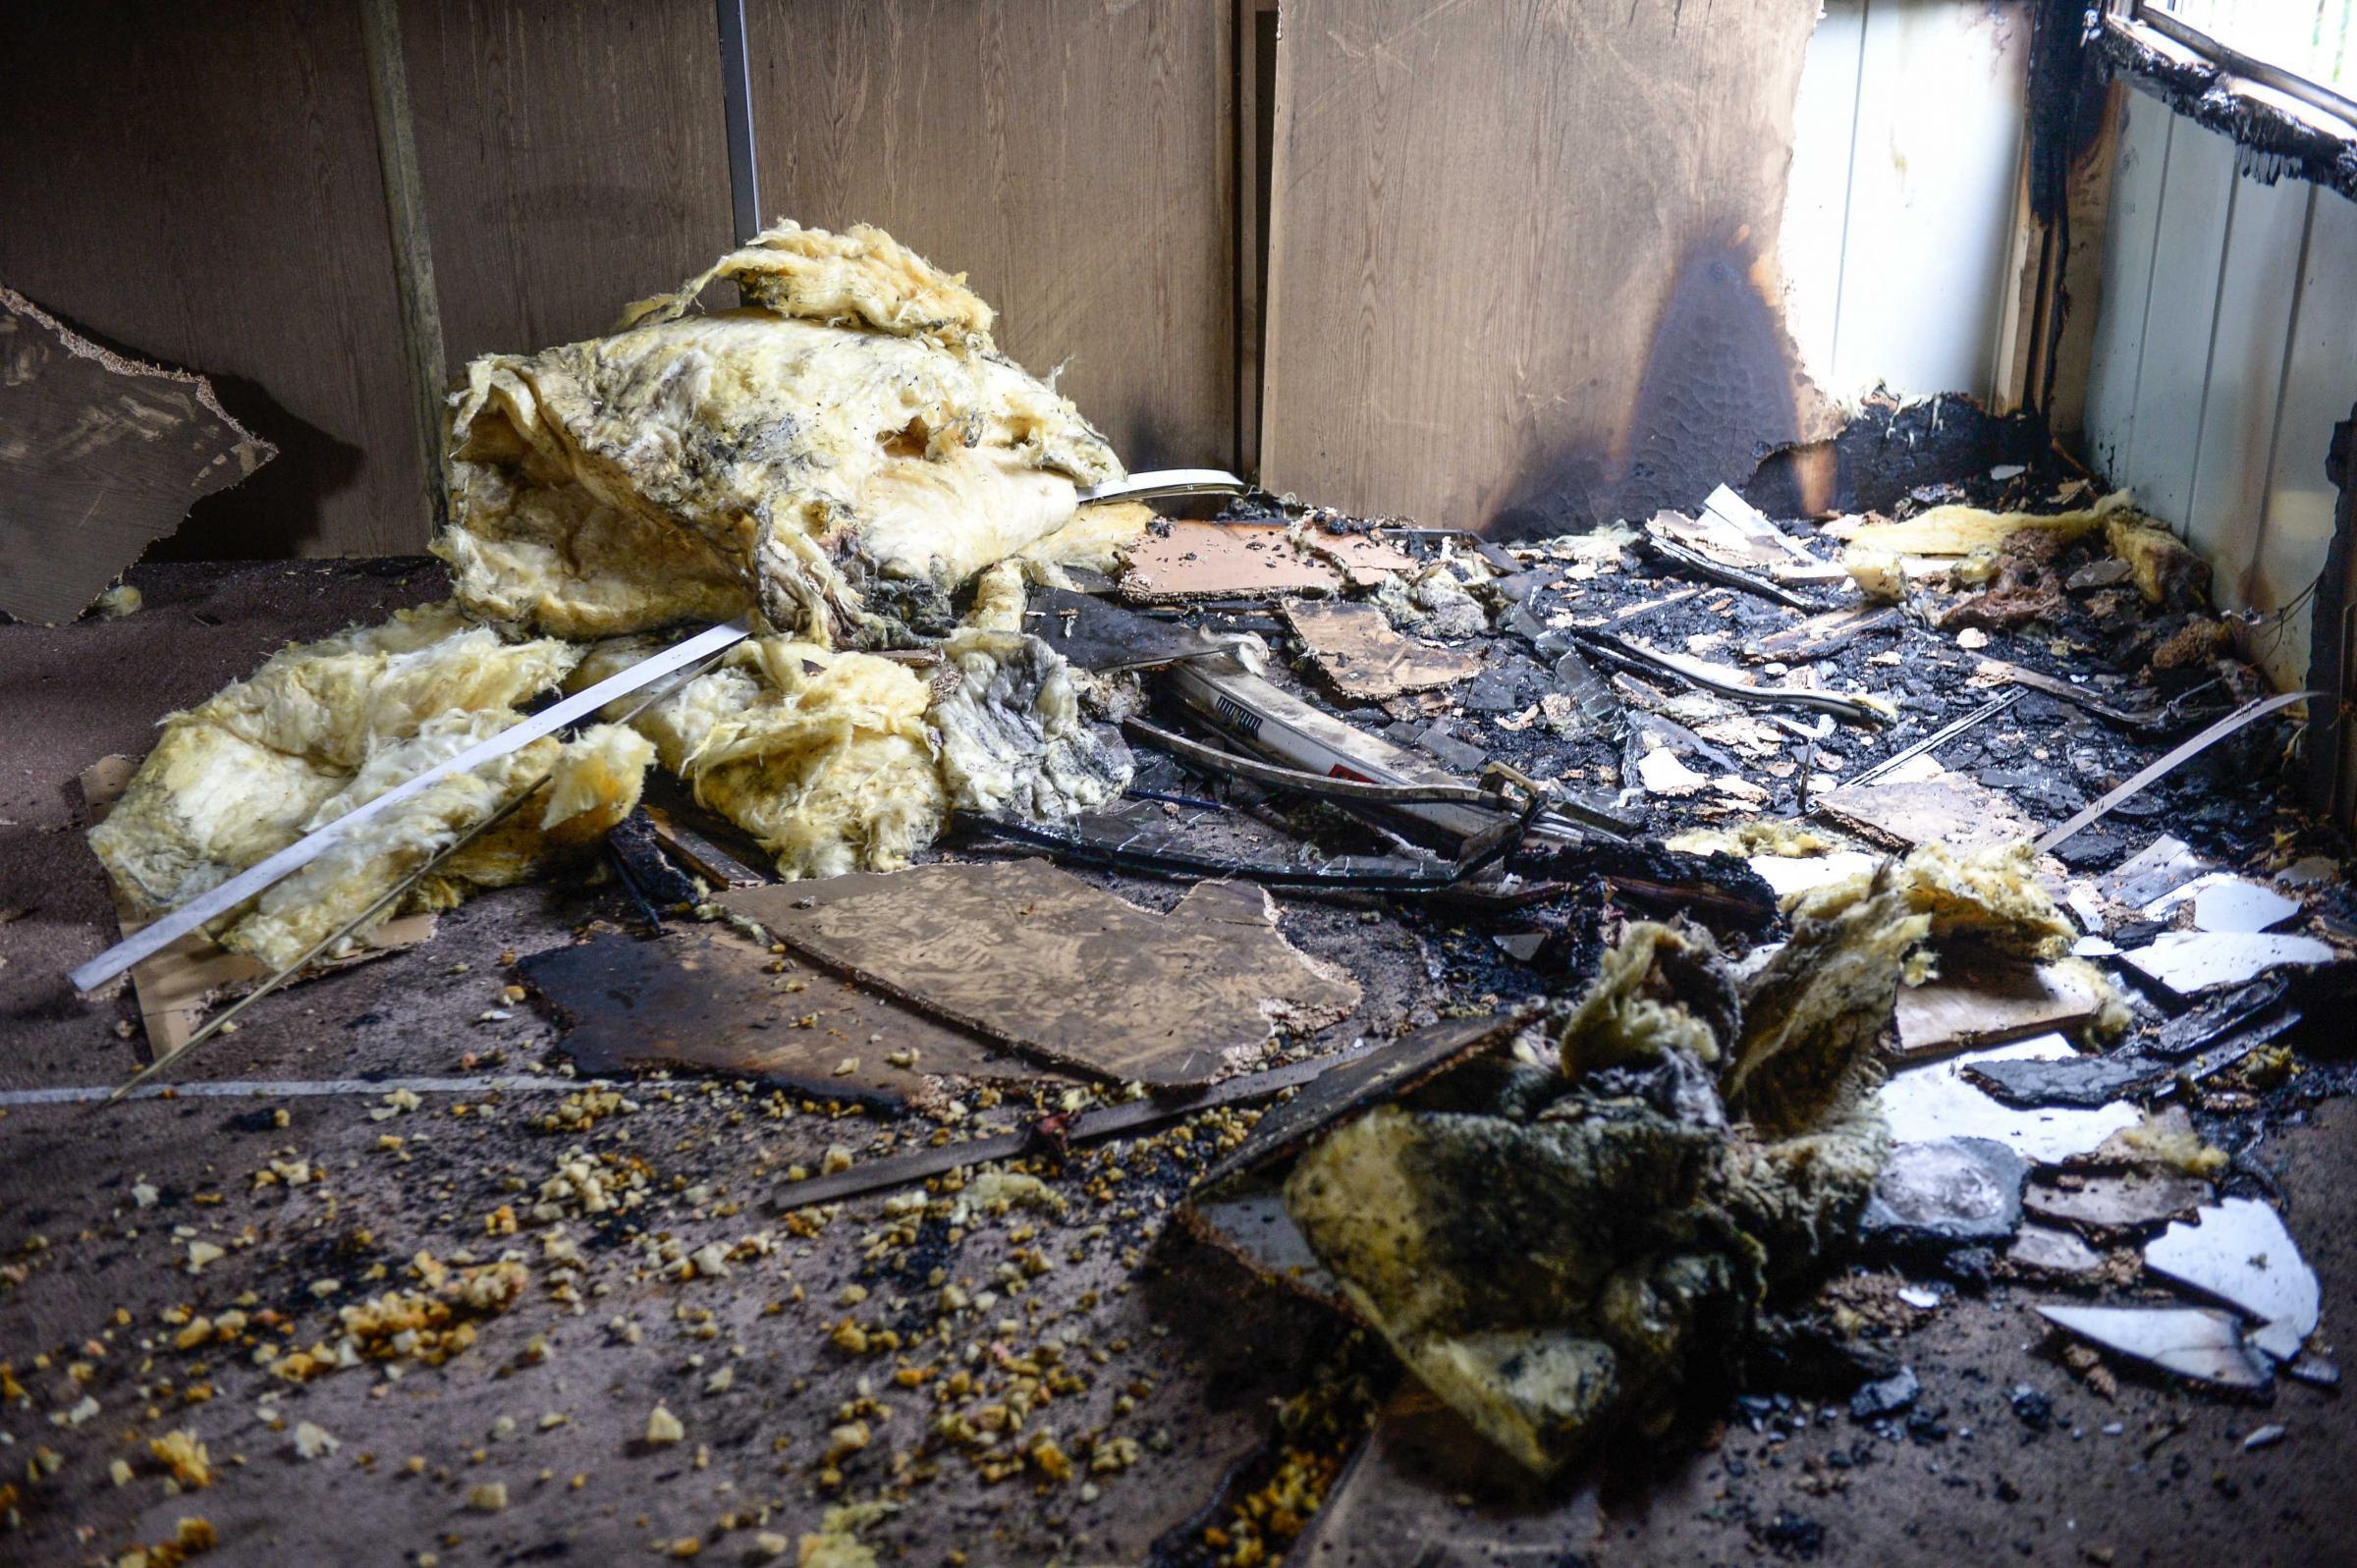 Muslim community center in Glasgow firebombed